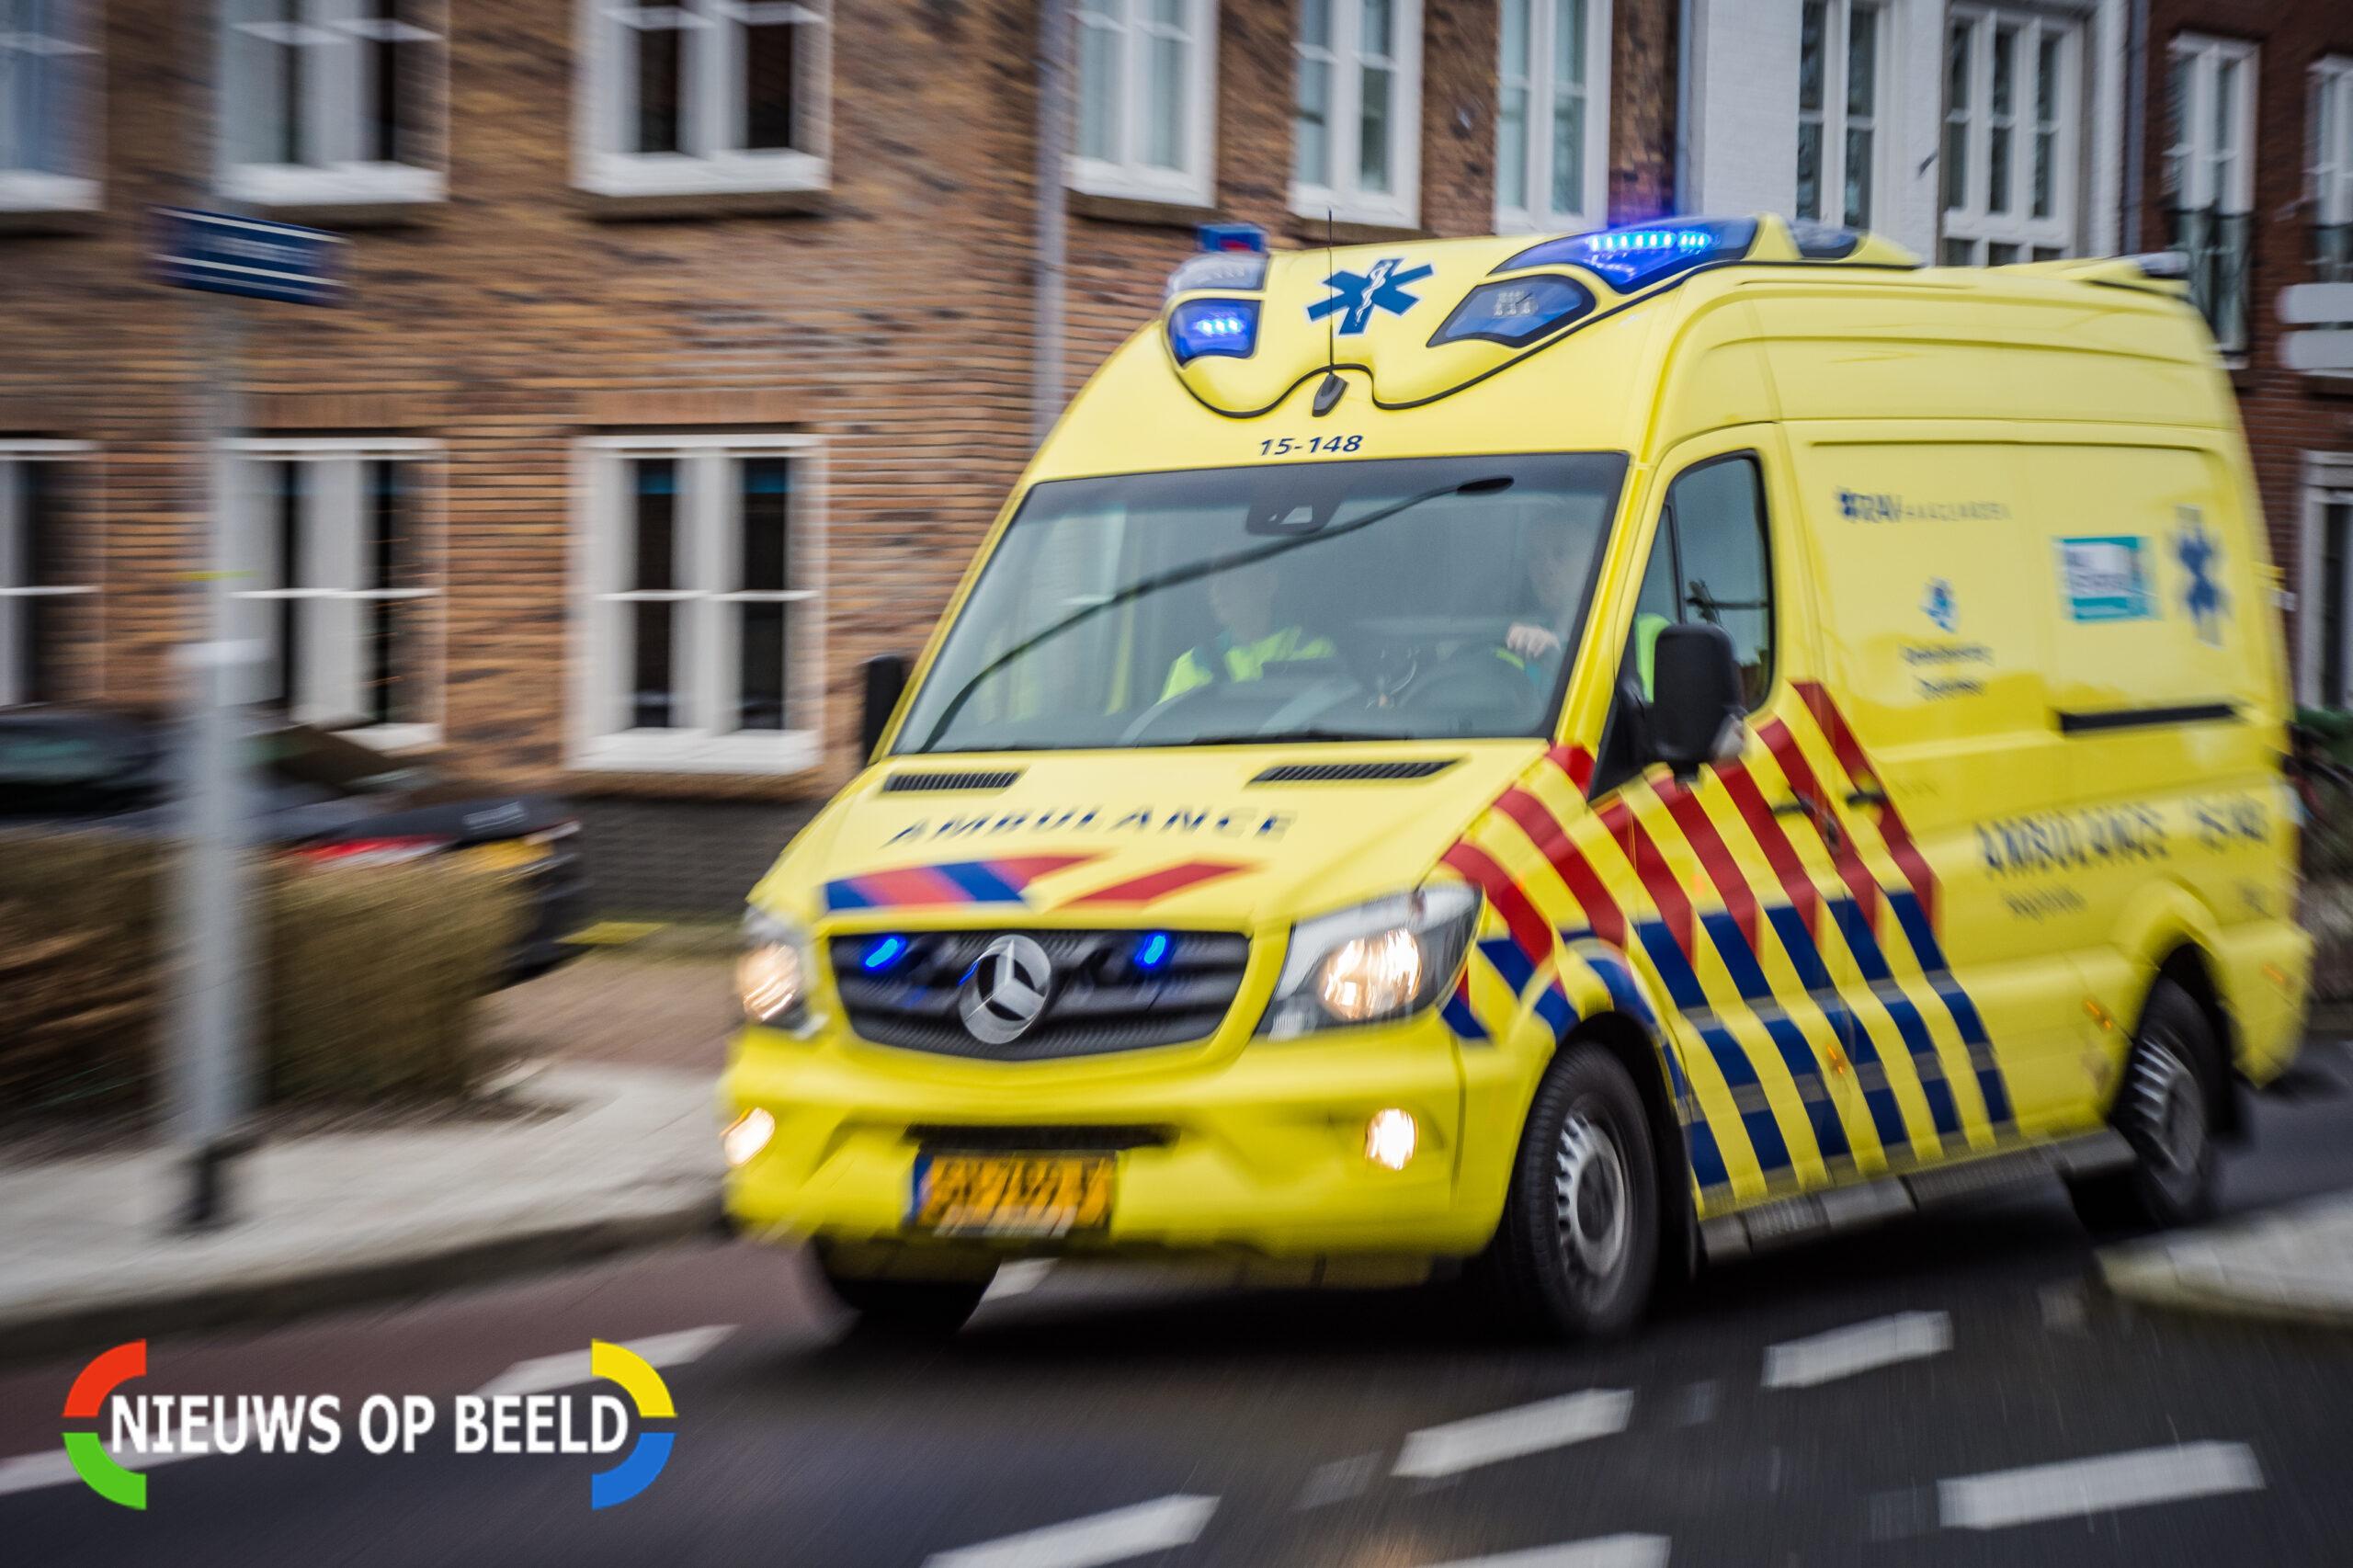 Persoon ernstig gewond na steekpartij in woning Transvaalstraat Dordrecht